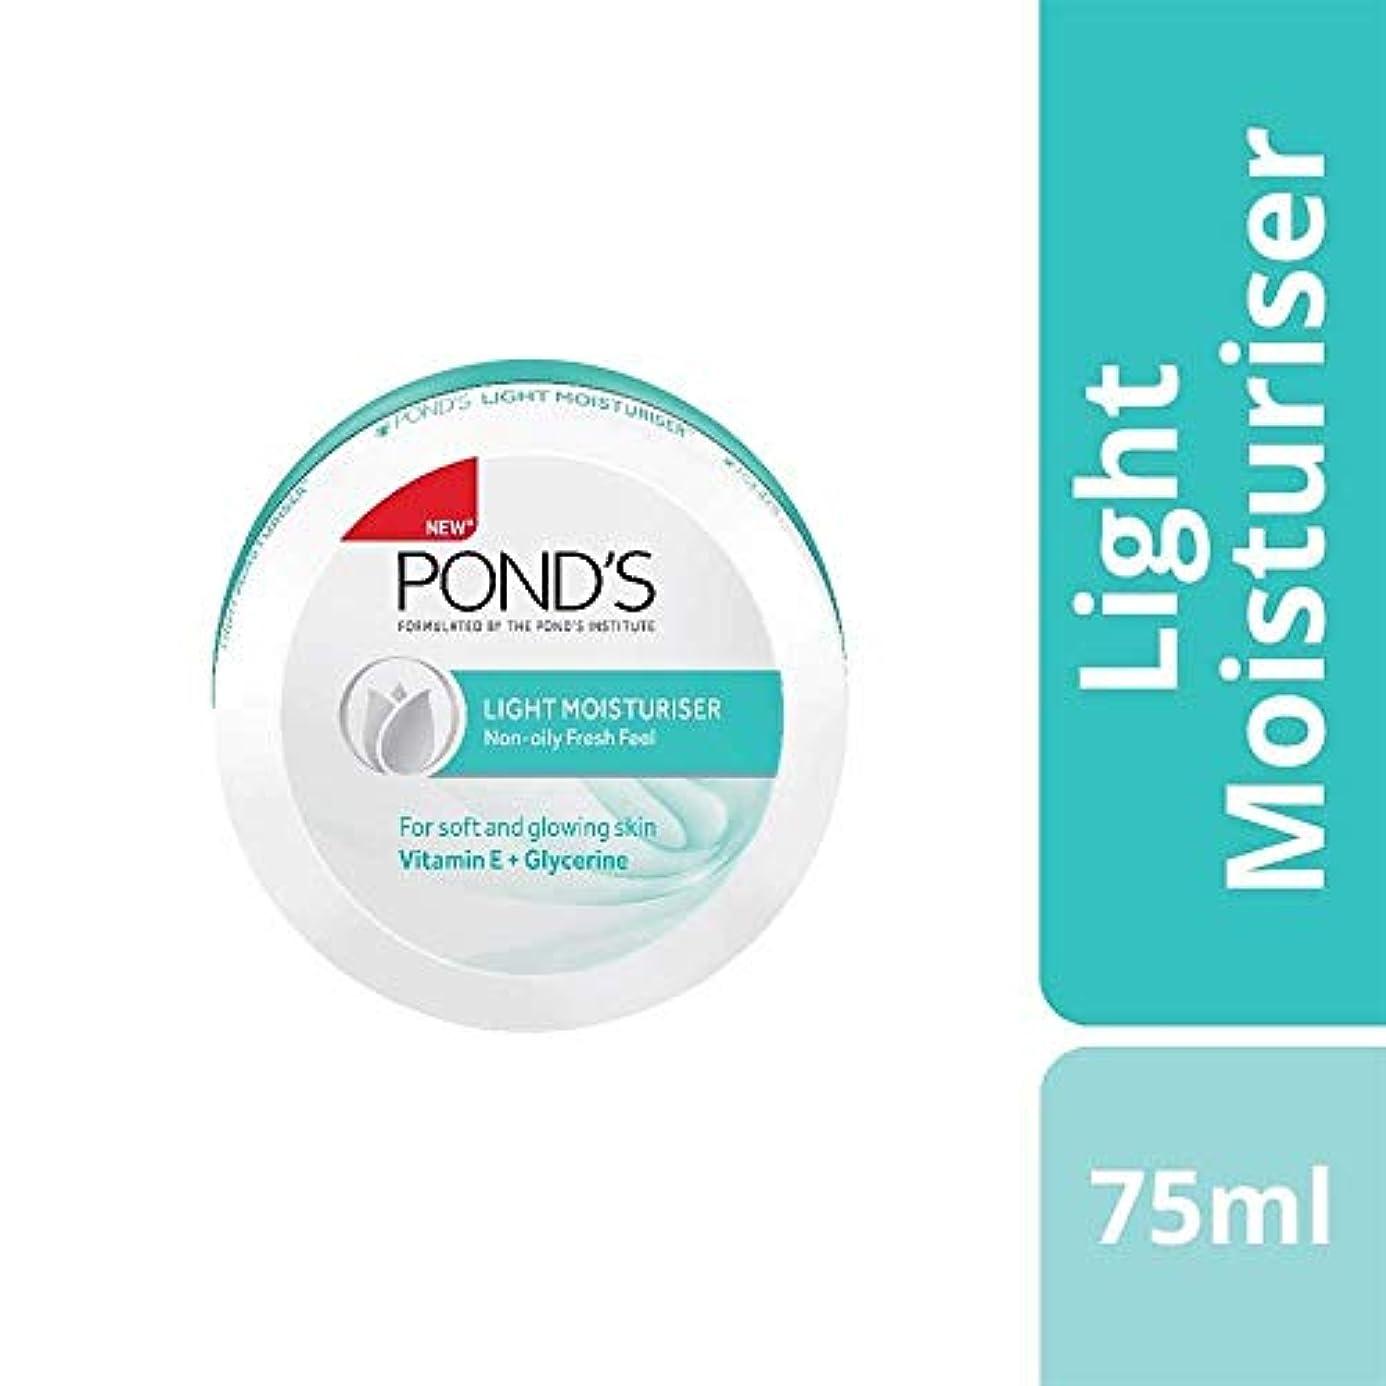 Ponds Light Moisturiser 75 ML - India